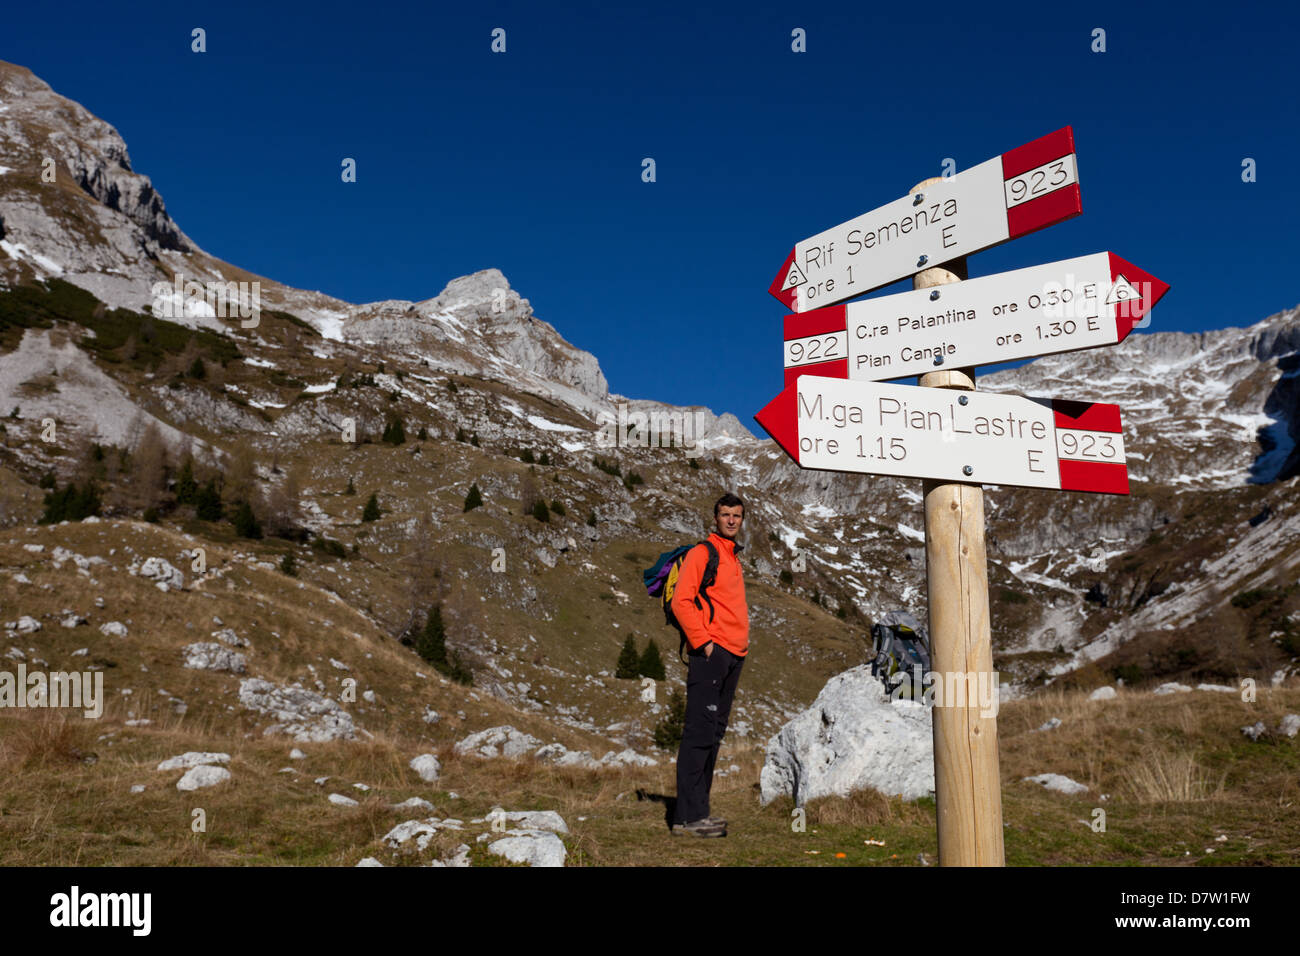 Signs along the track to Semenza refuge, Alpago, Belluno, Veneto, Italy - Stock Image